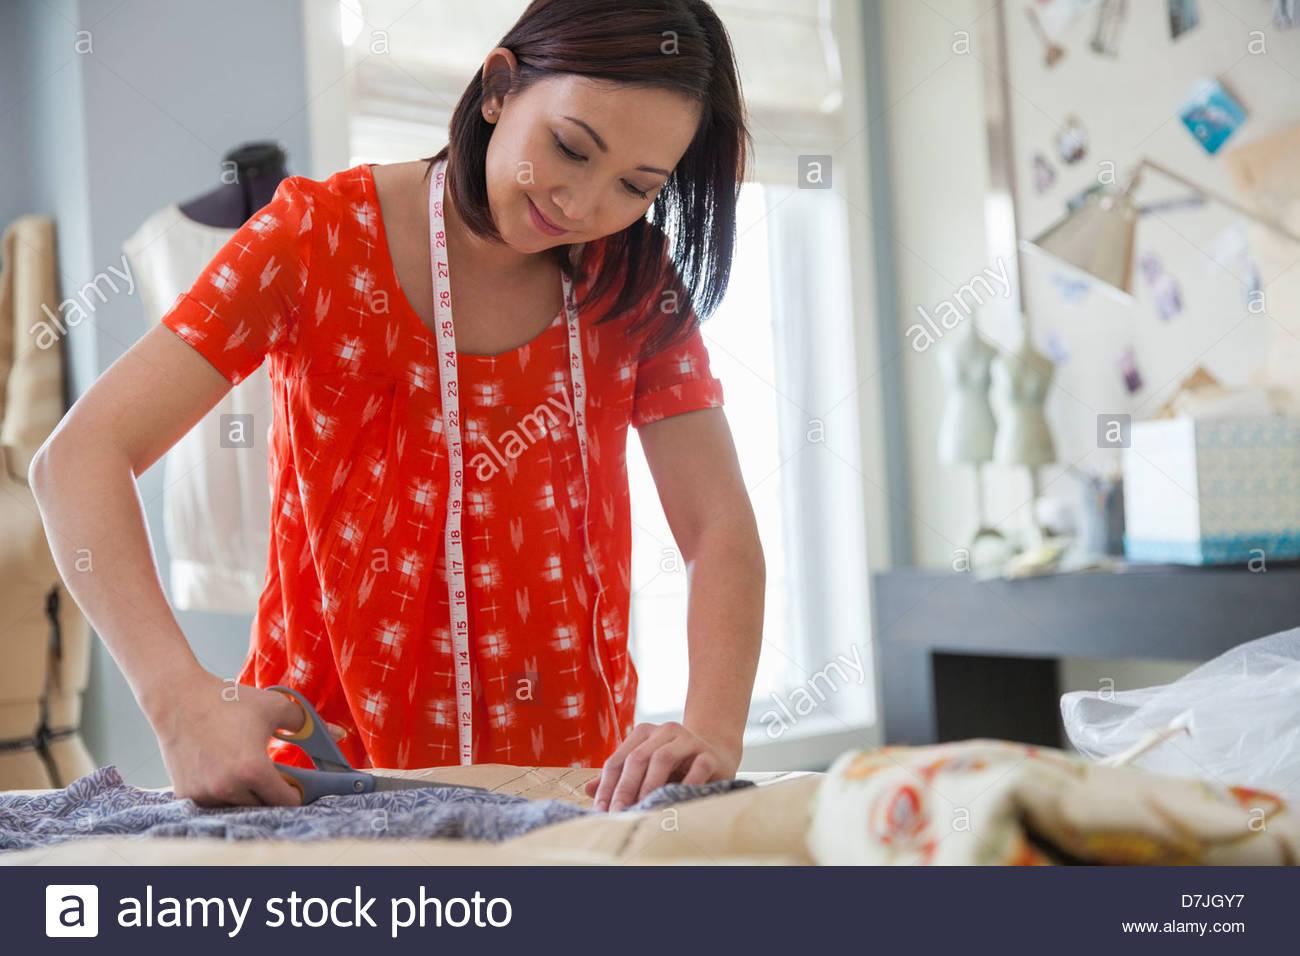 Weibliche Näherin arbeiten im Heimstudio Stockfoto